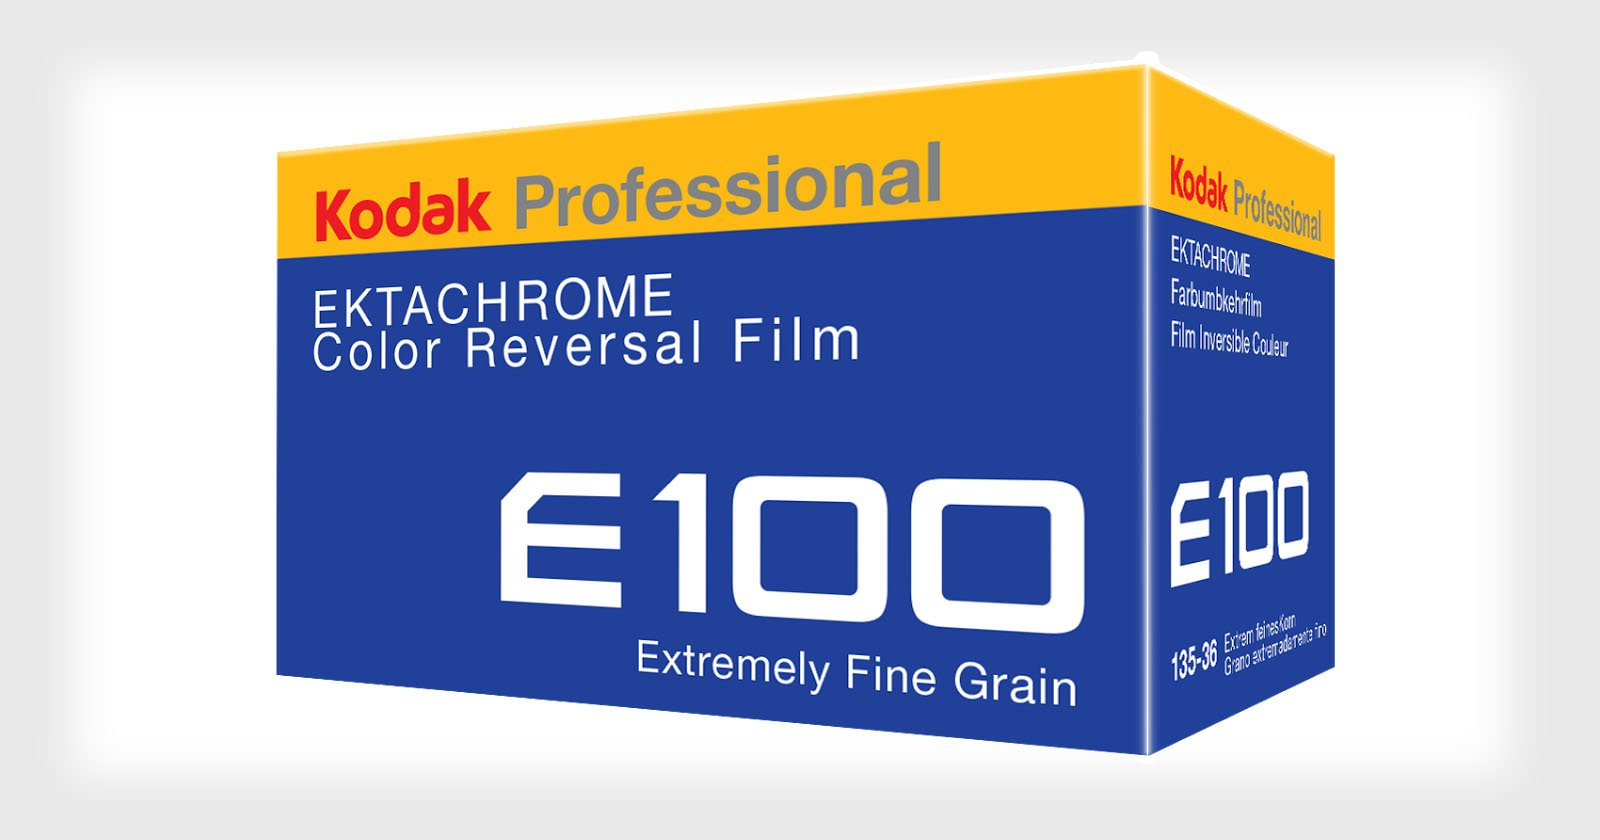 Kodak Ektachrome is Now in the Hands of Testers